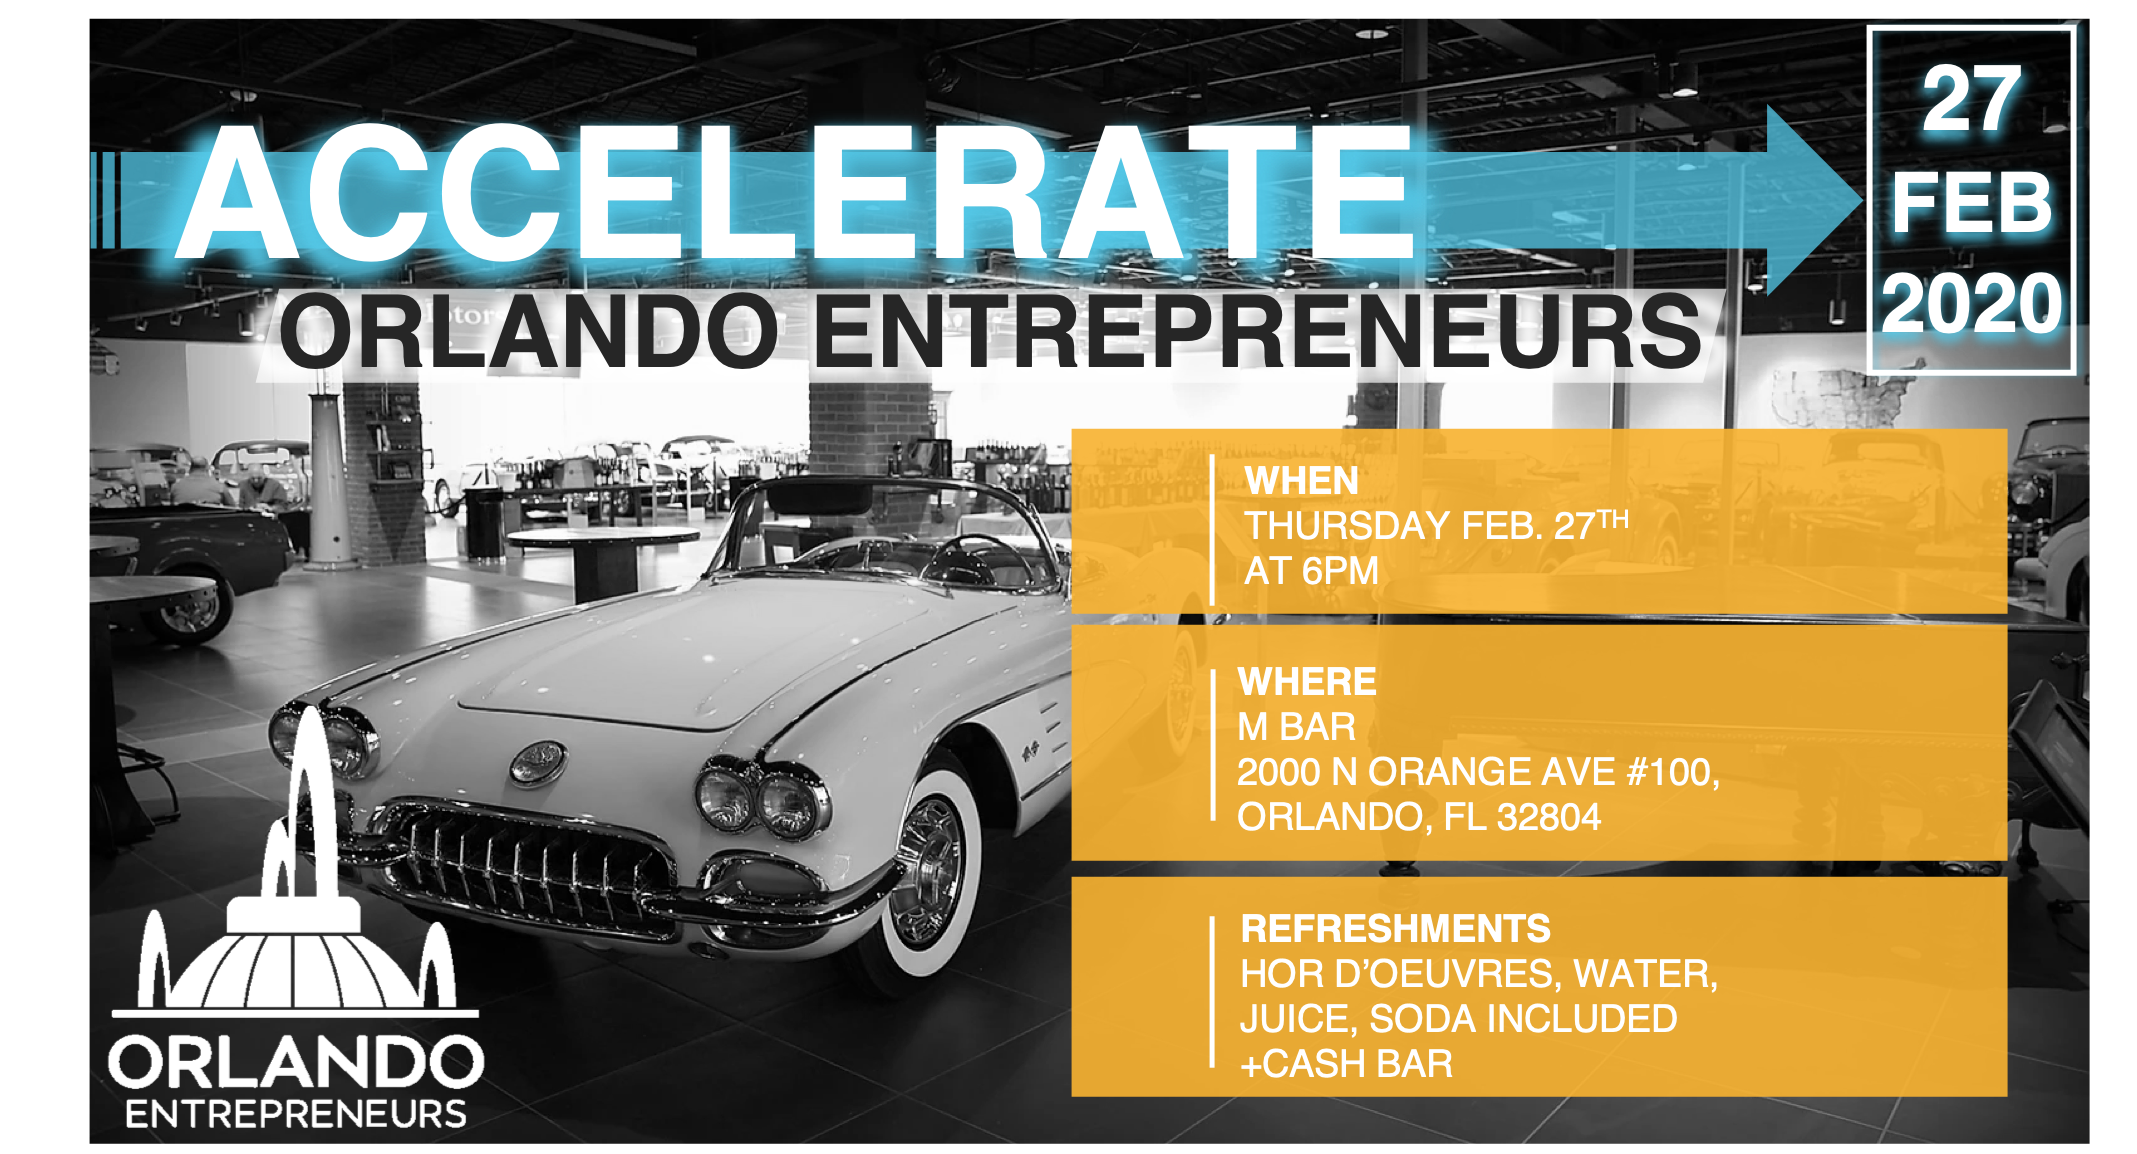 Accelerate Orlando Entrepreneurs Postponed Orlando Entrepreneurs